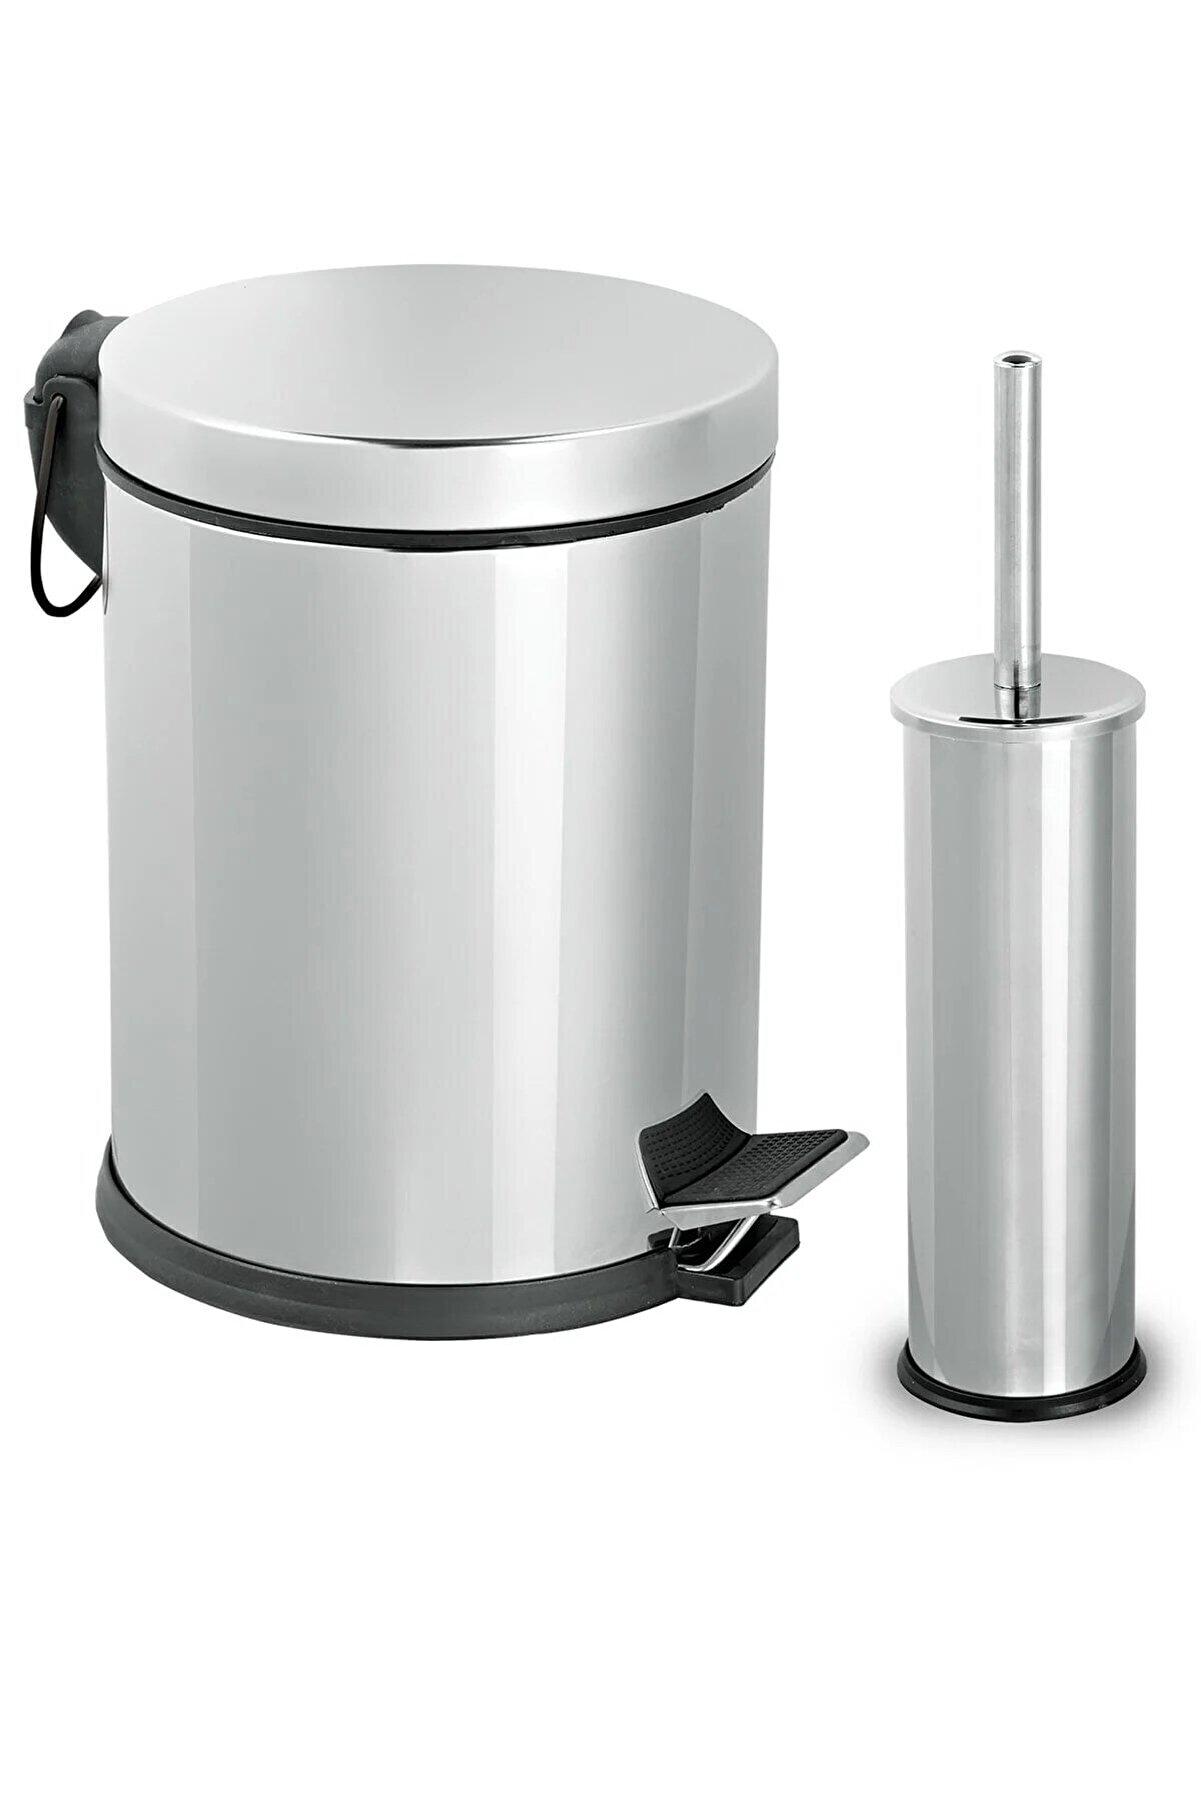 Sas 3lt Krom 2'li Banyo Seti Pedallı Çöp Kovası Wc Klozet Tuvalet Fırça Seti Banyo Çöp Kovası